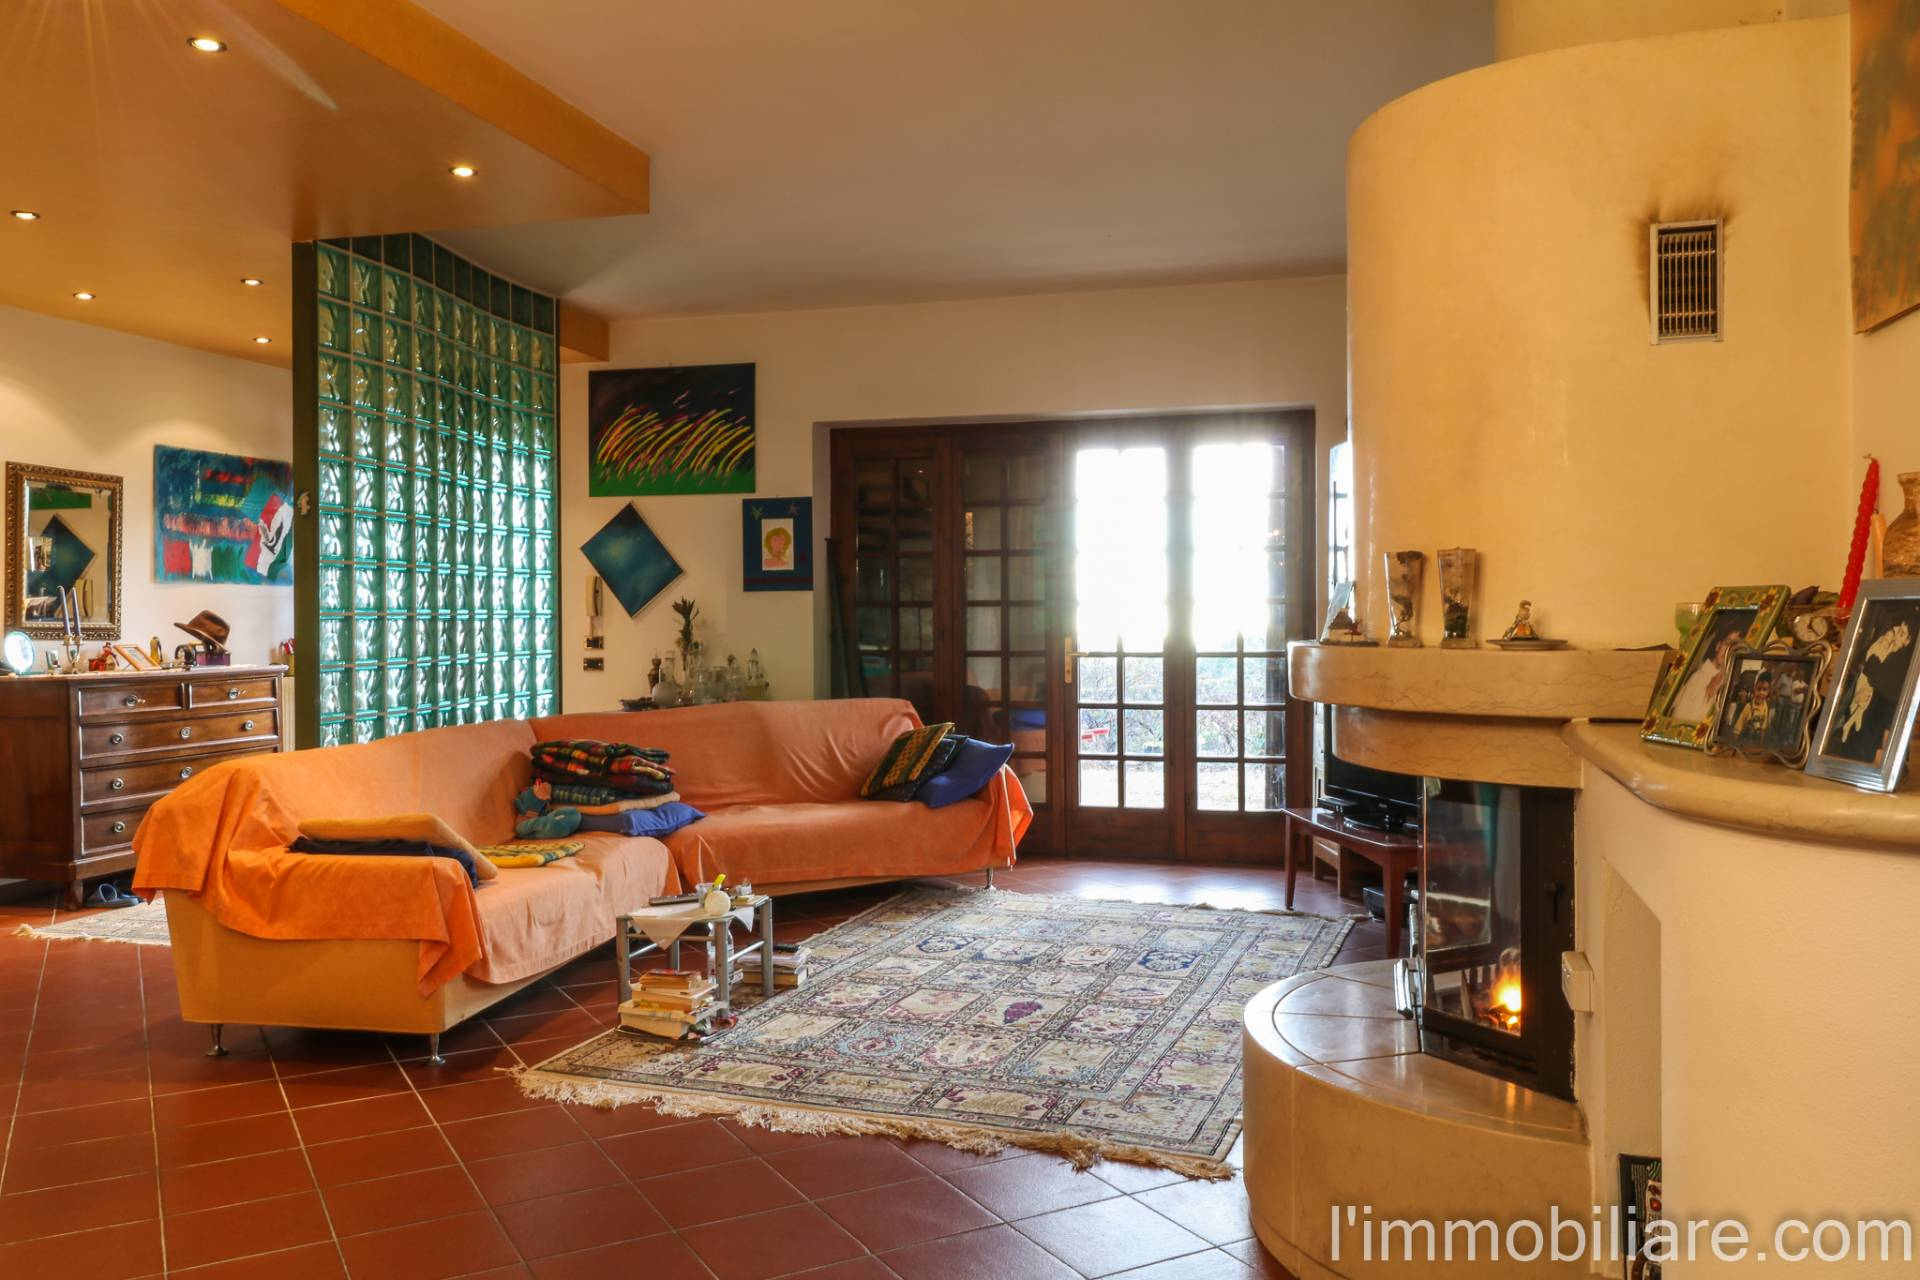 Villa in Vendita a Negrar Periferia: 5 locali, 250 mq